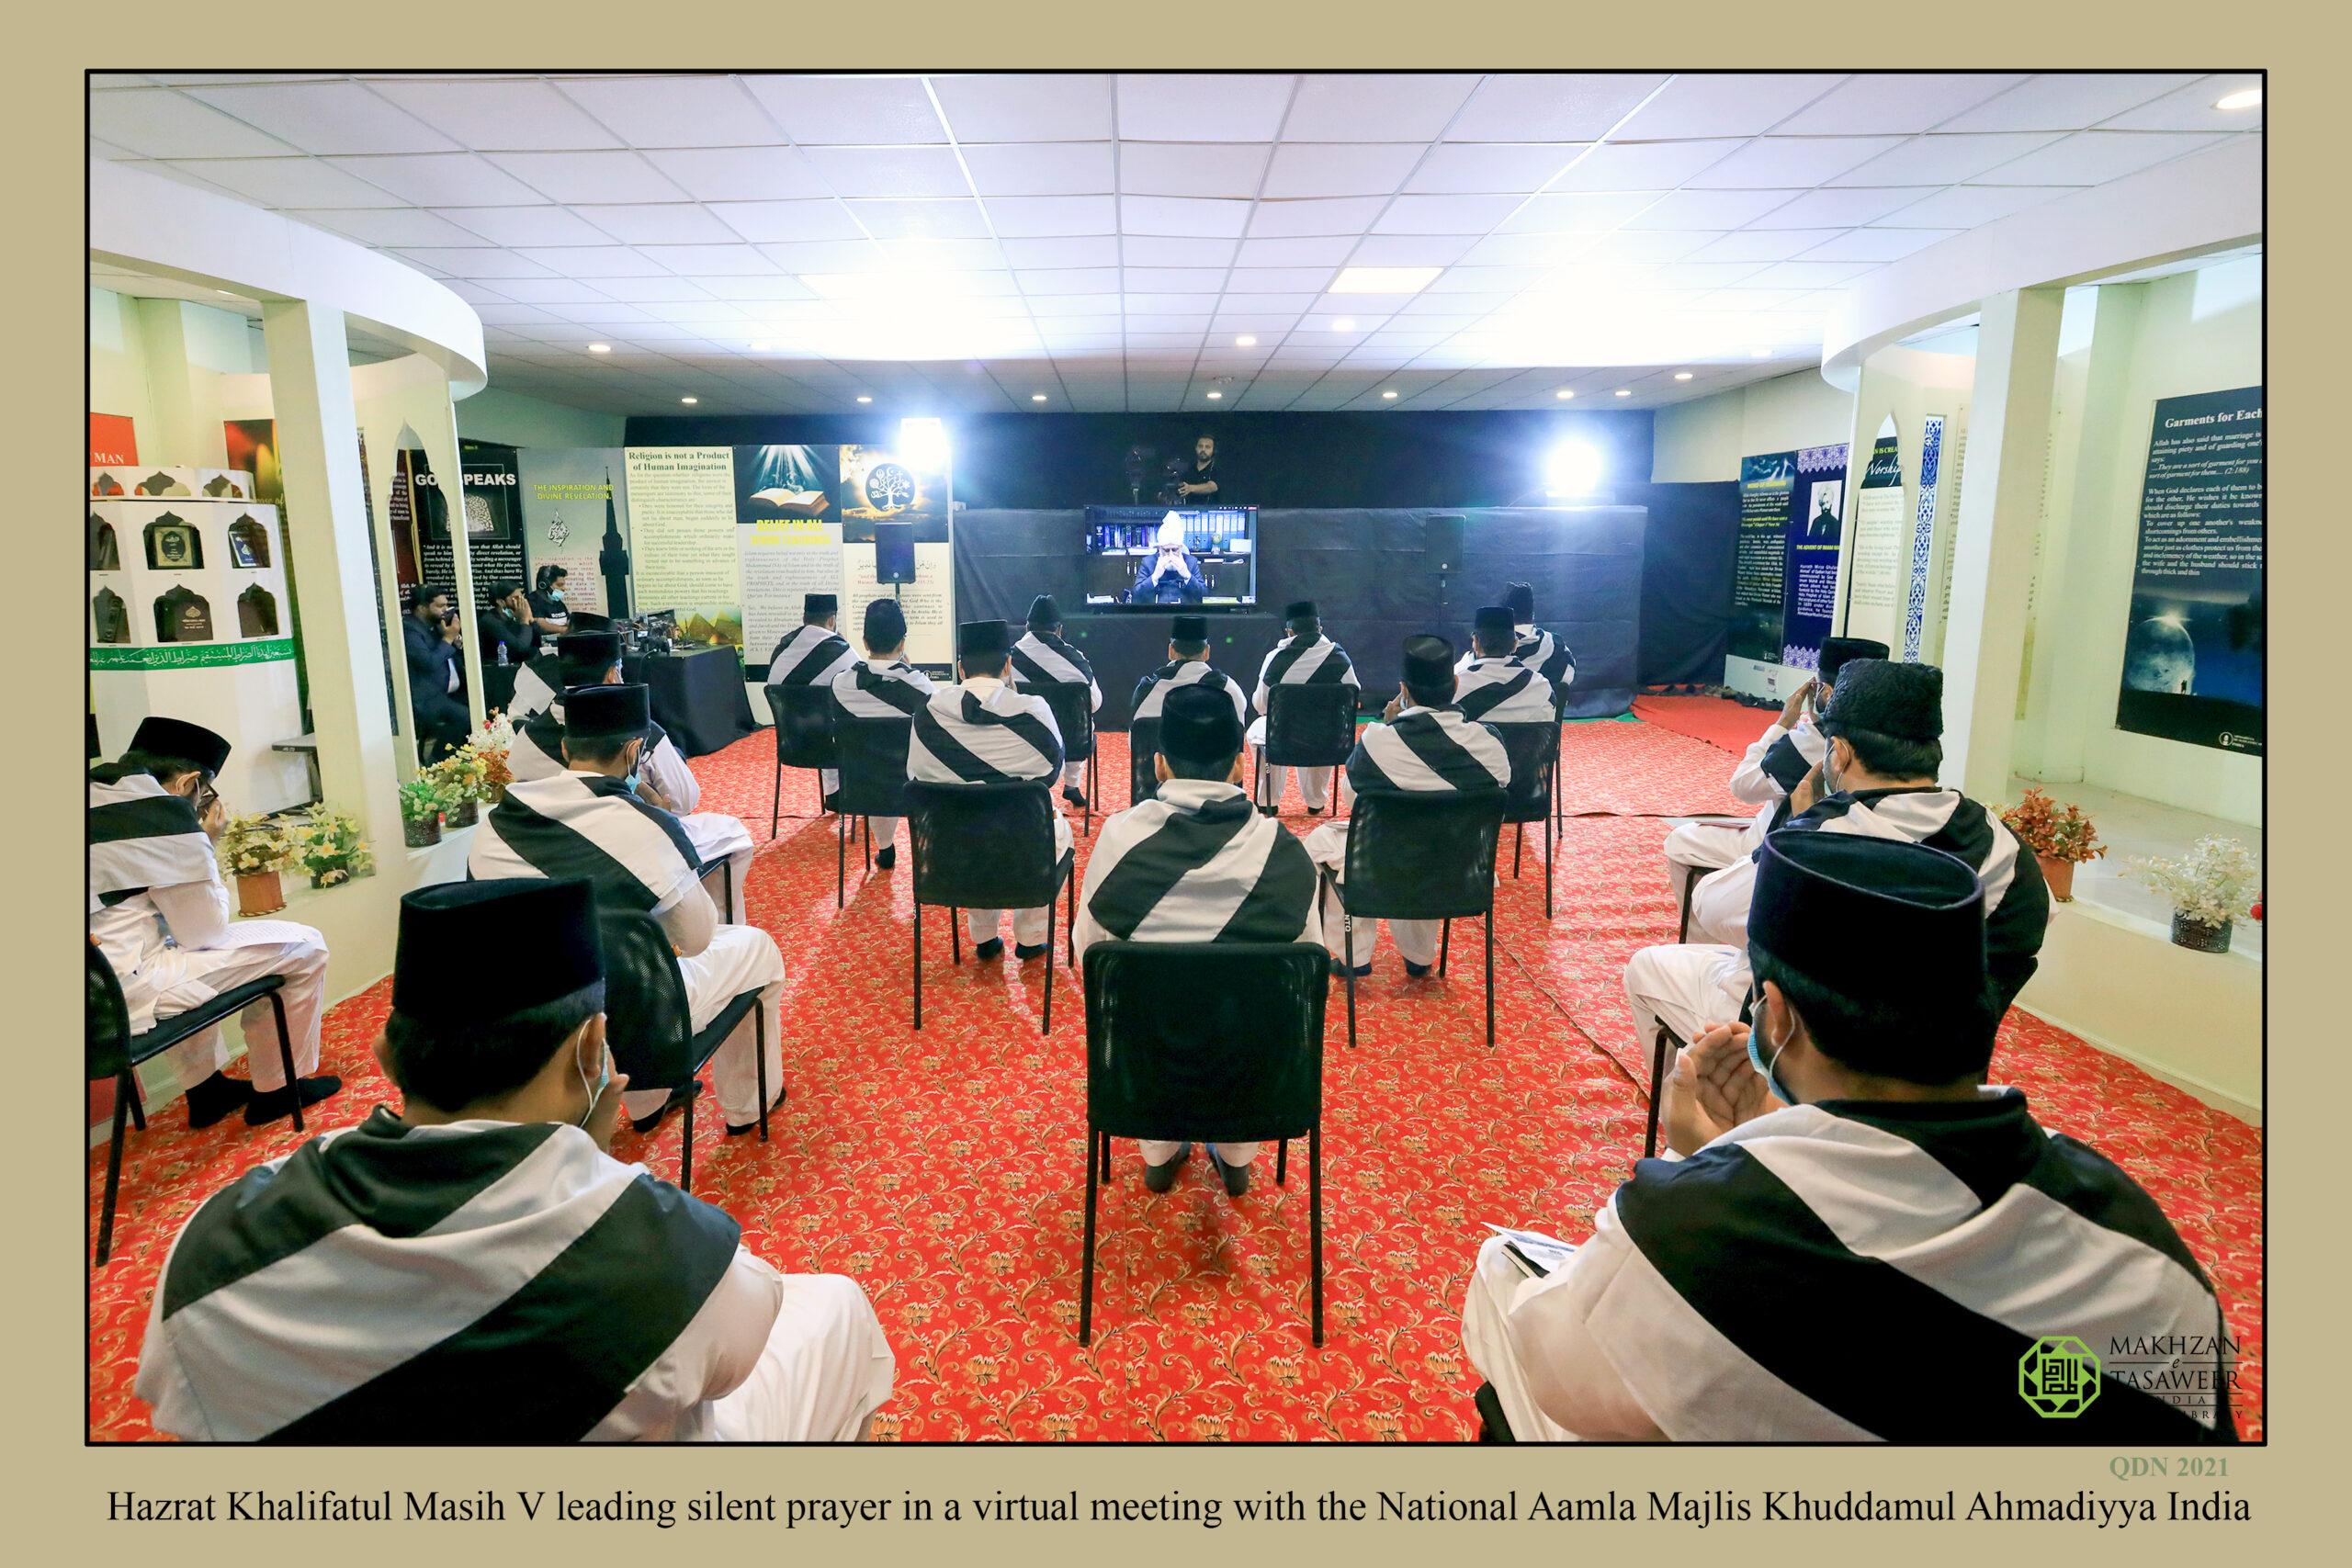 Hazrat Khalifatul Masih V grants a virtual meeting to the national Aamla Majlis Khuddamul Ahmadiyya India 006